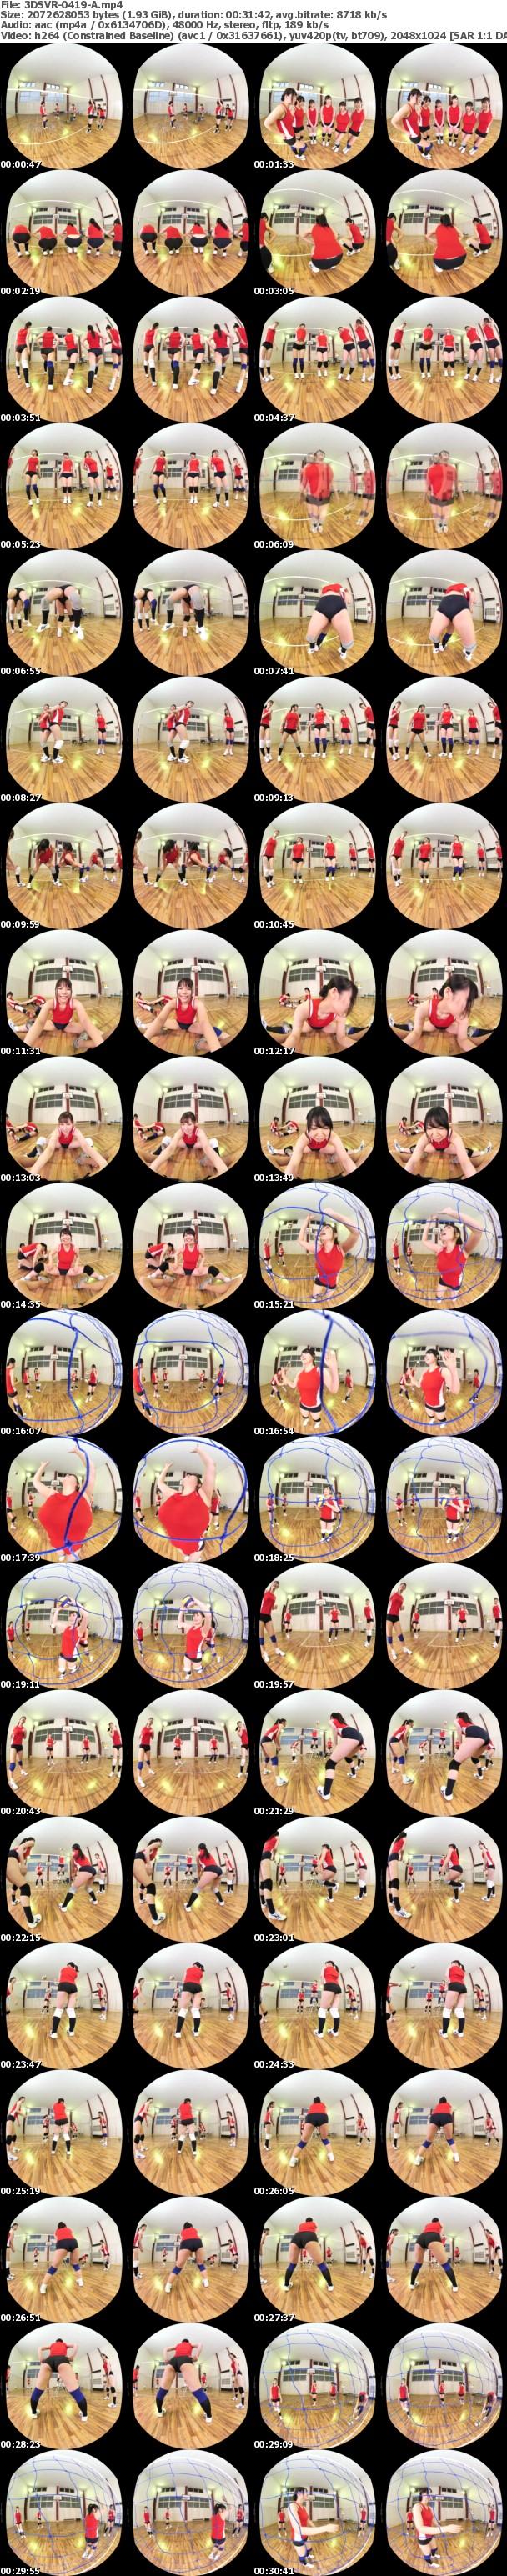 (VR) 3DSVR-0419 ママさんバレーVR 巨乳巨尻人妻のムレムレブルマ姿に興奮!